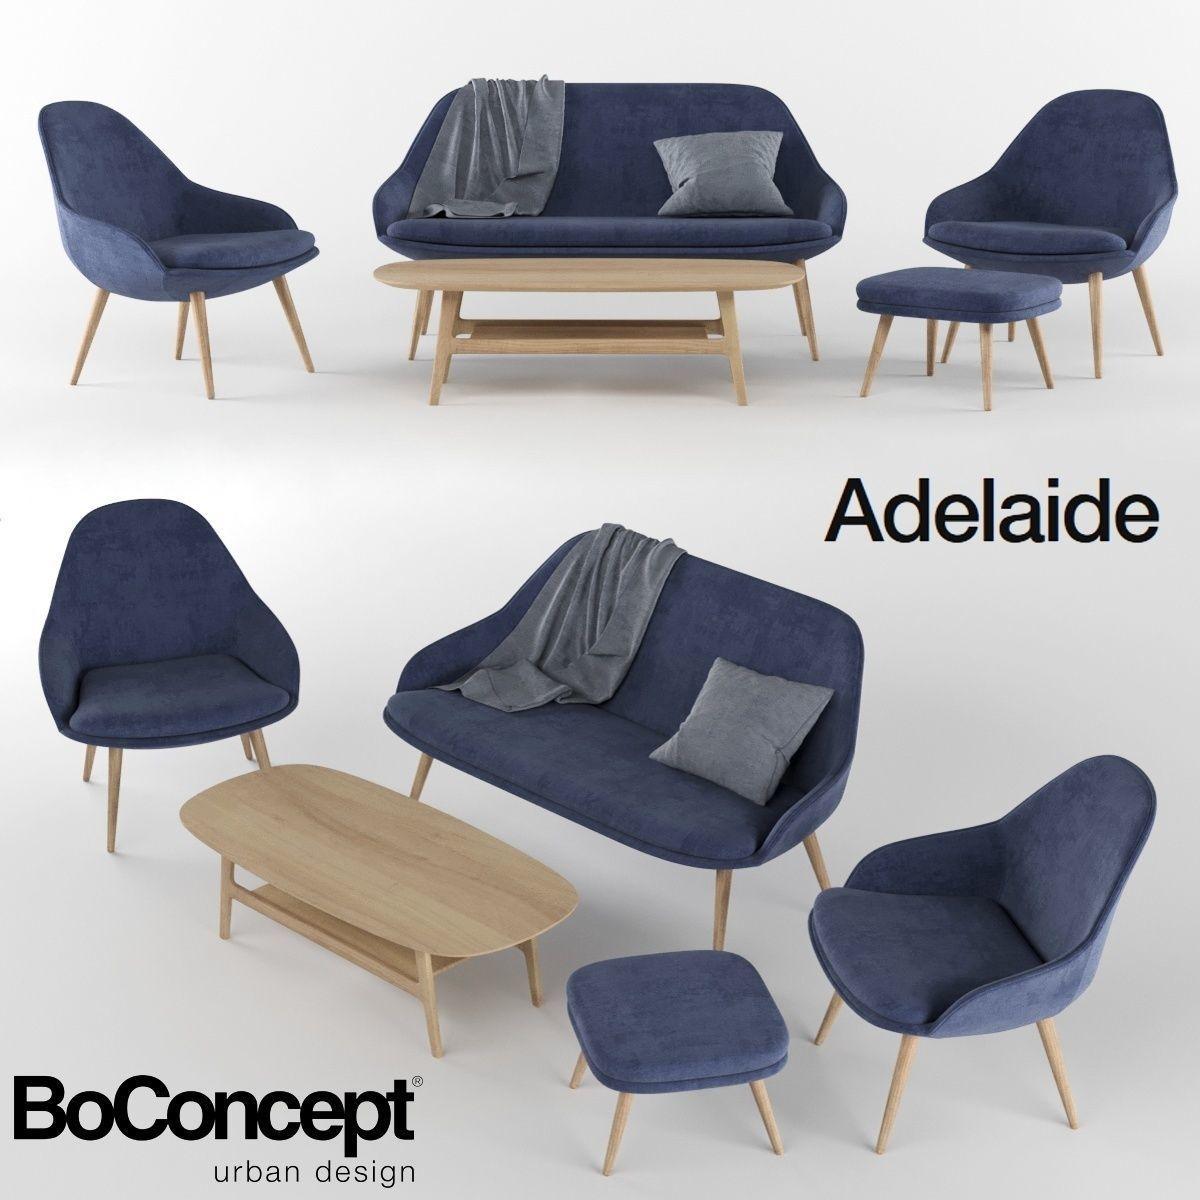 Astounding Boconcept Adelaide Furniture Collection 3D Model Machost Co Dining Chair Design Ideas Machostcouk